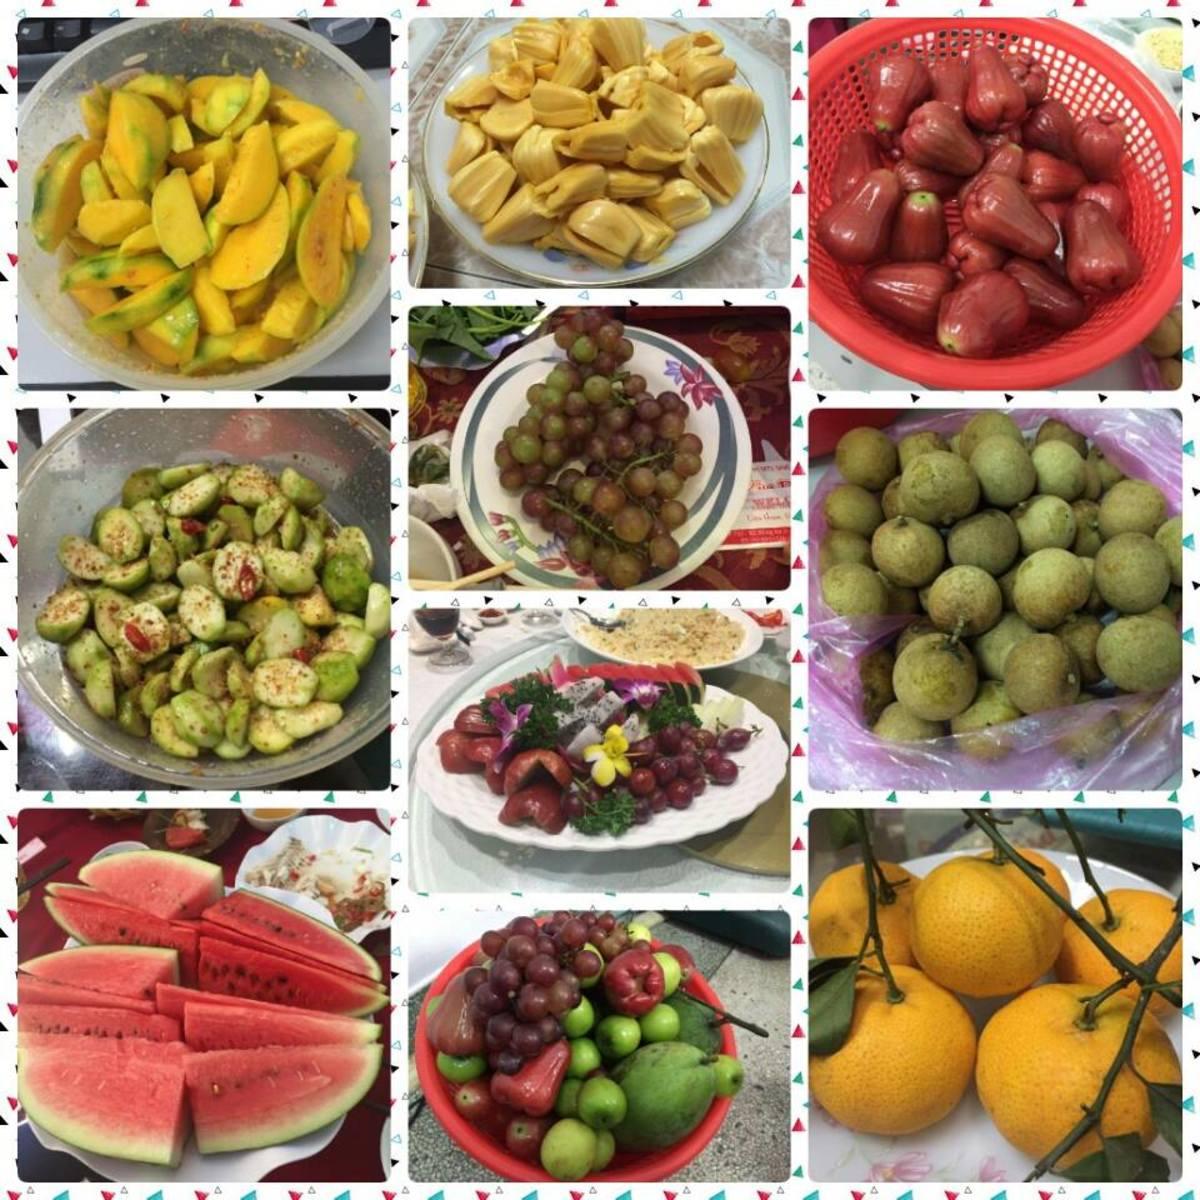 Fruit paradise in the tropics!